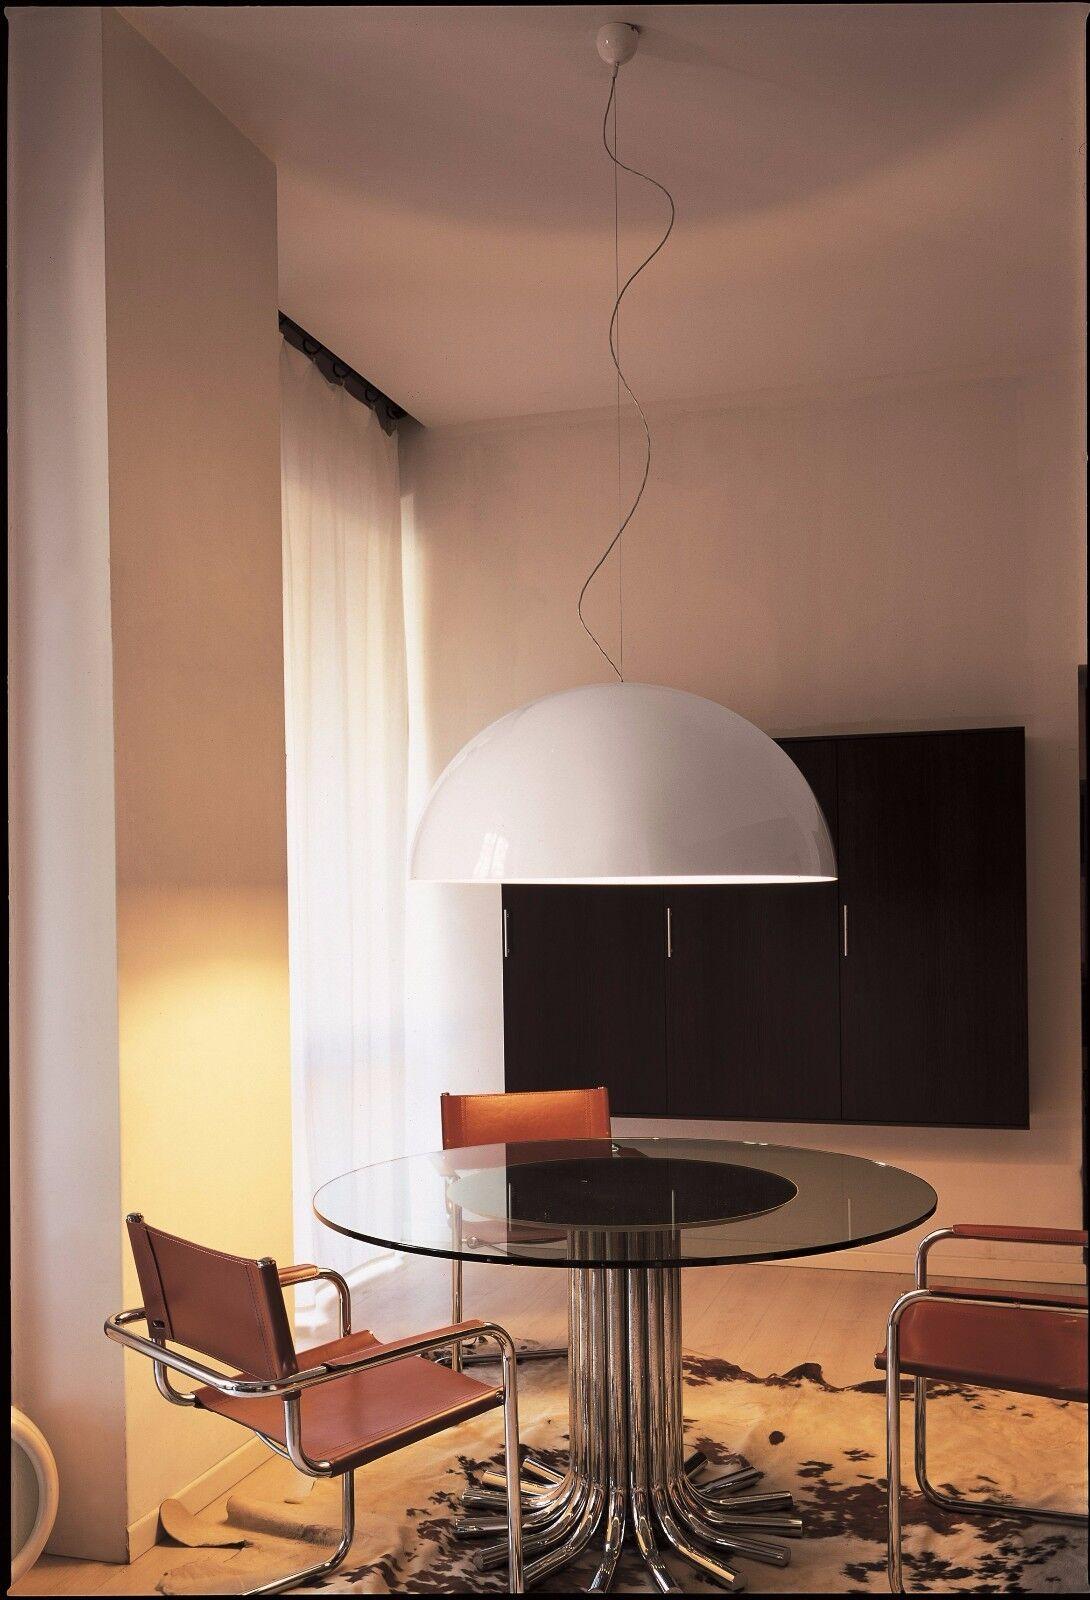 IT-OLuce - SONORA 411 411 411 - sospensione suspension - vetro opale opal glass cf105b